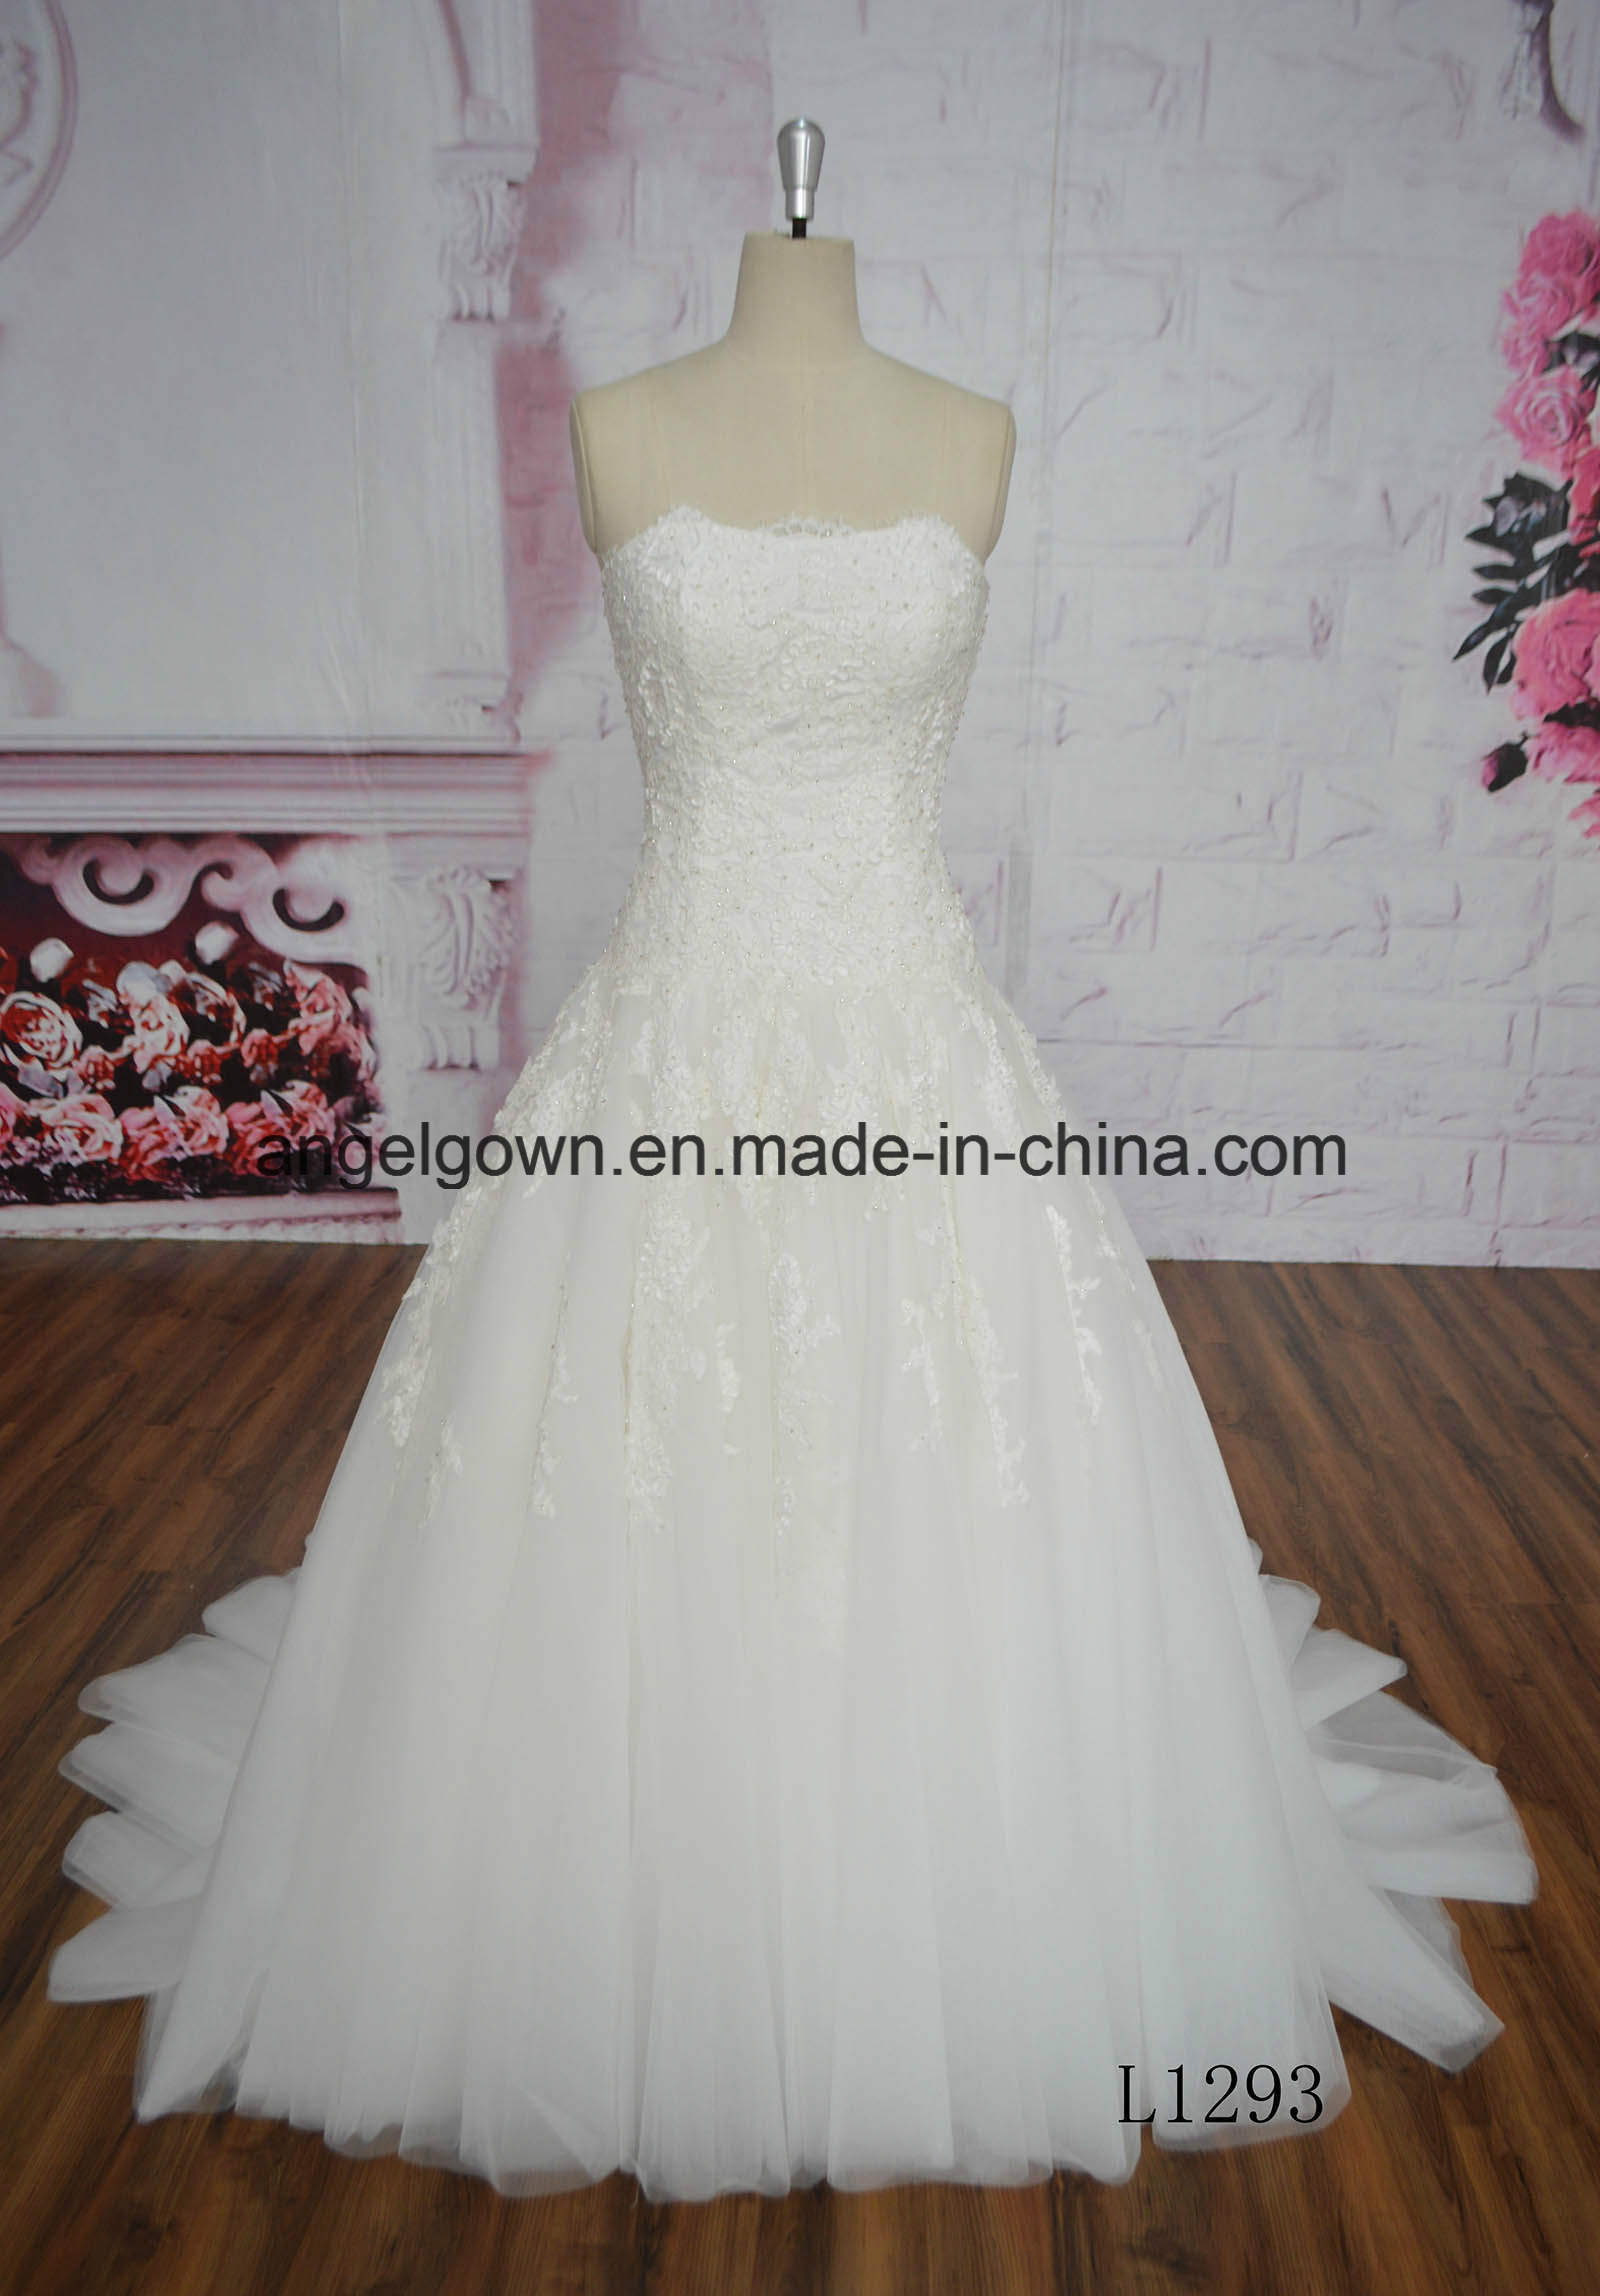 China Factory Price Strapless Beading Lace Ivory Wedding Dress L1293 ...